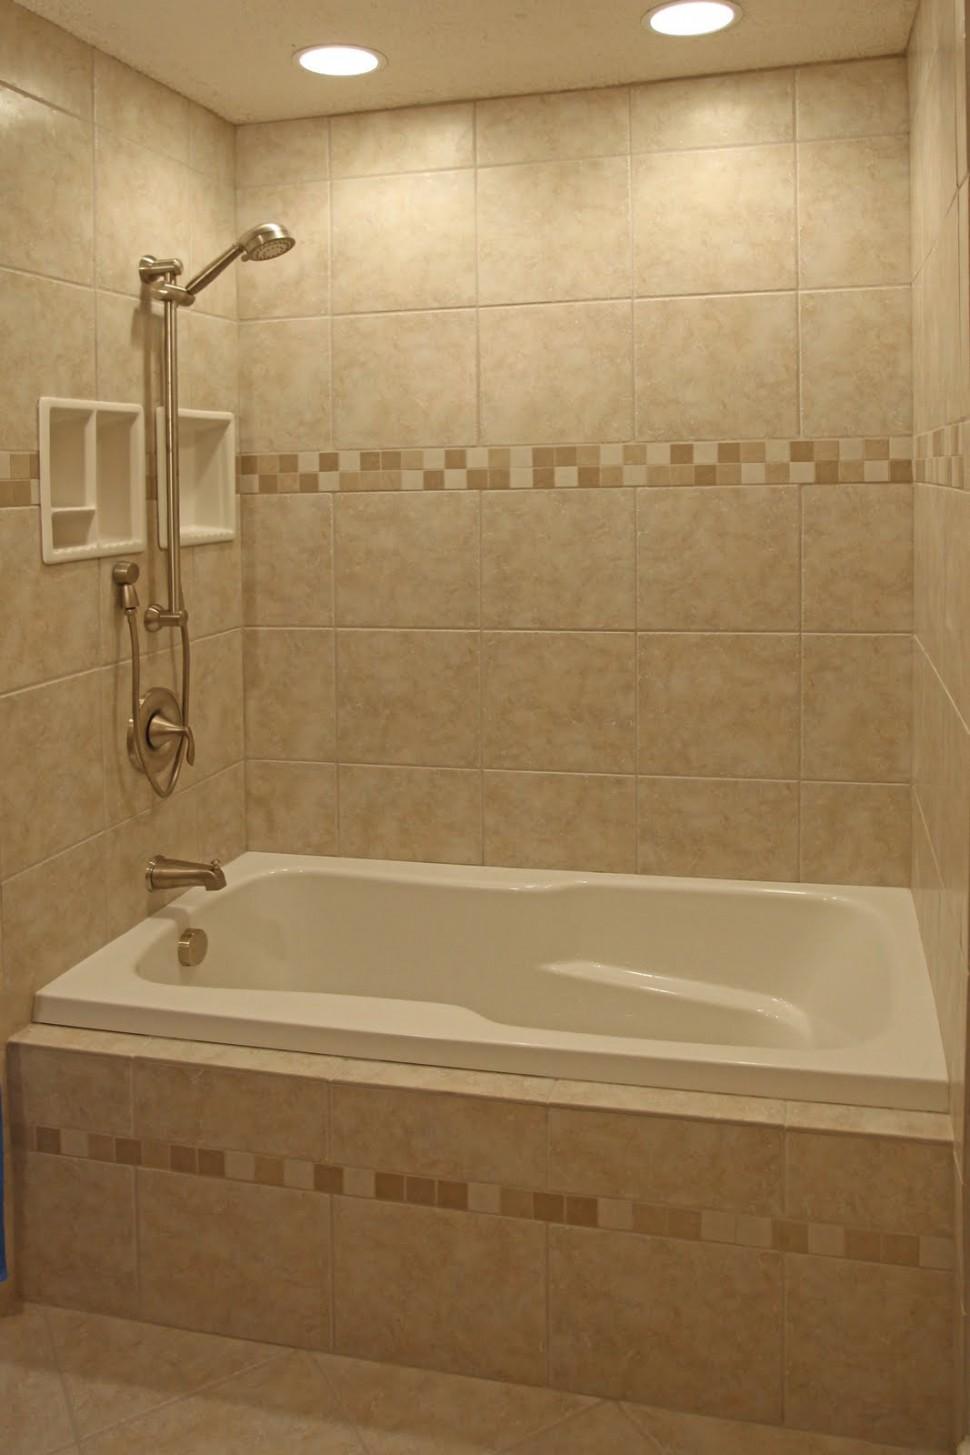 Elegant-Small-Bathroom-Tile-Ideas-with-White-Bathtub-Design-Finished-in-elegnat-Design-with-Interated-Shower-and-Bathtub-Idea-970x1455